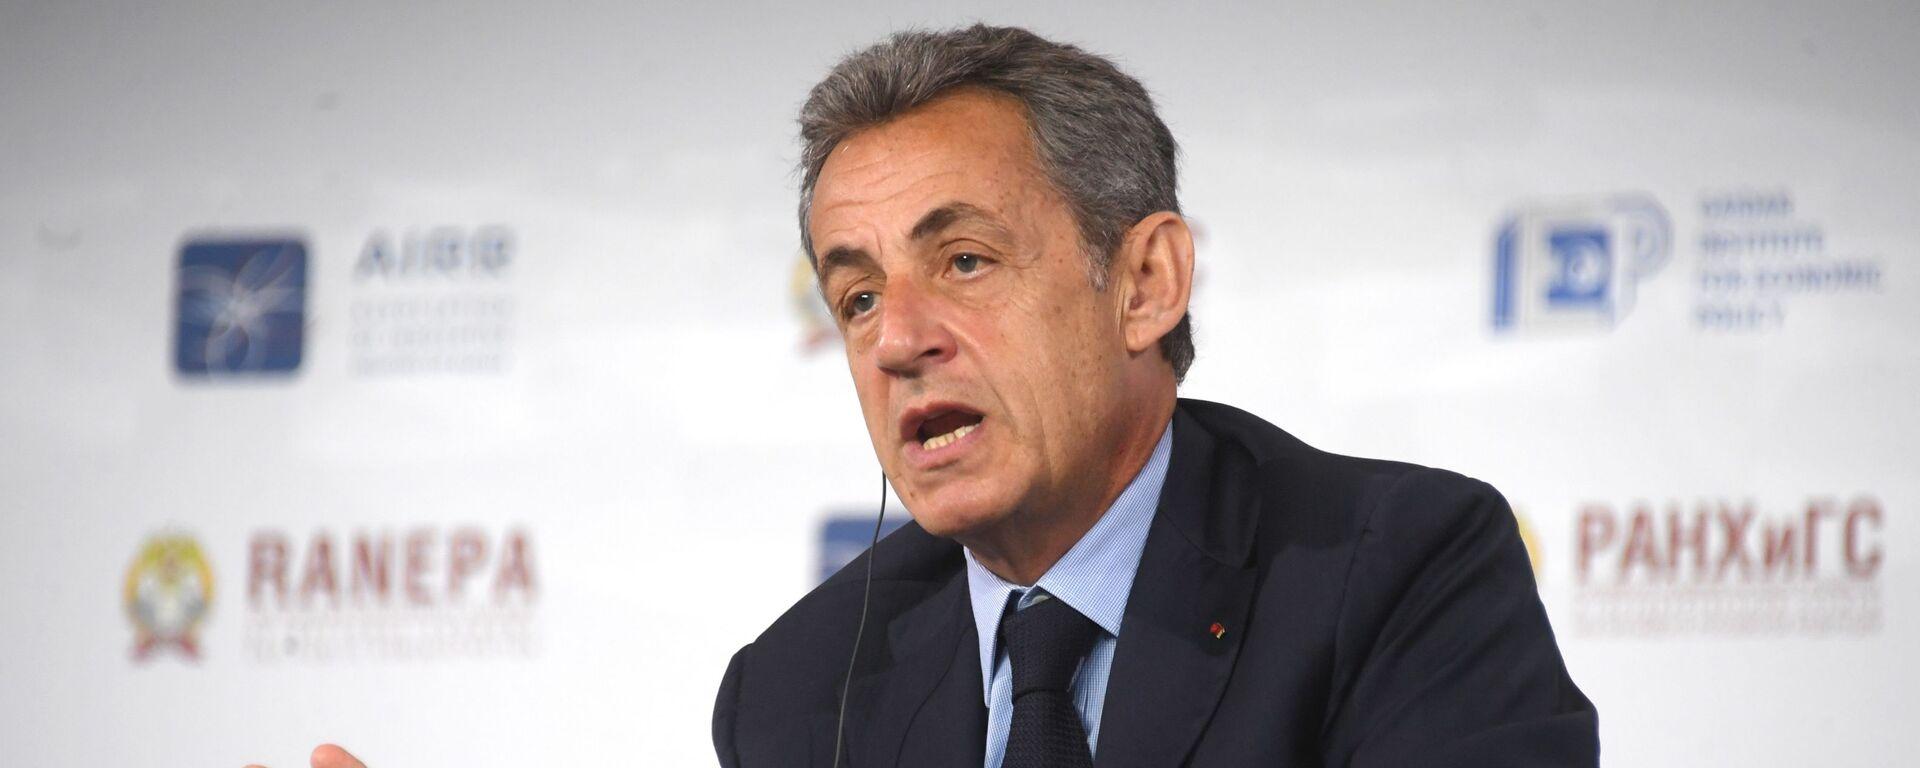 Nicolas Sarkozy auf dem 11. Gaidar-Forum in Moskau (Archivbild) - SNA, 1920, 30.09.2021